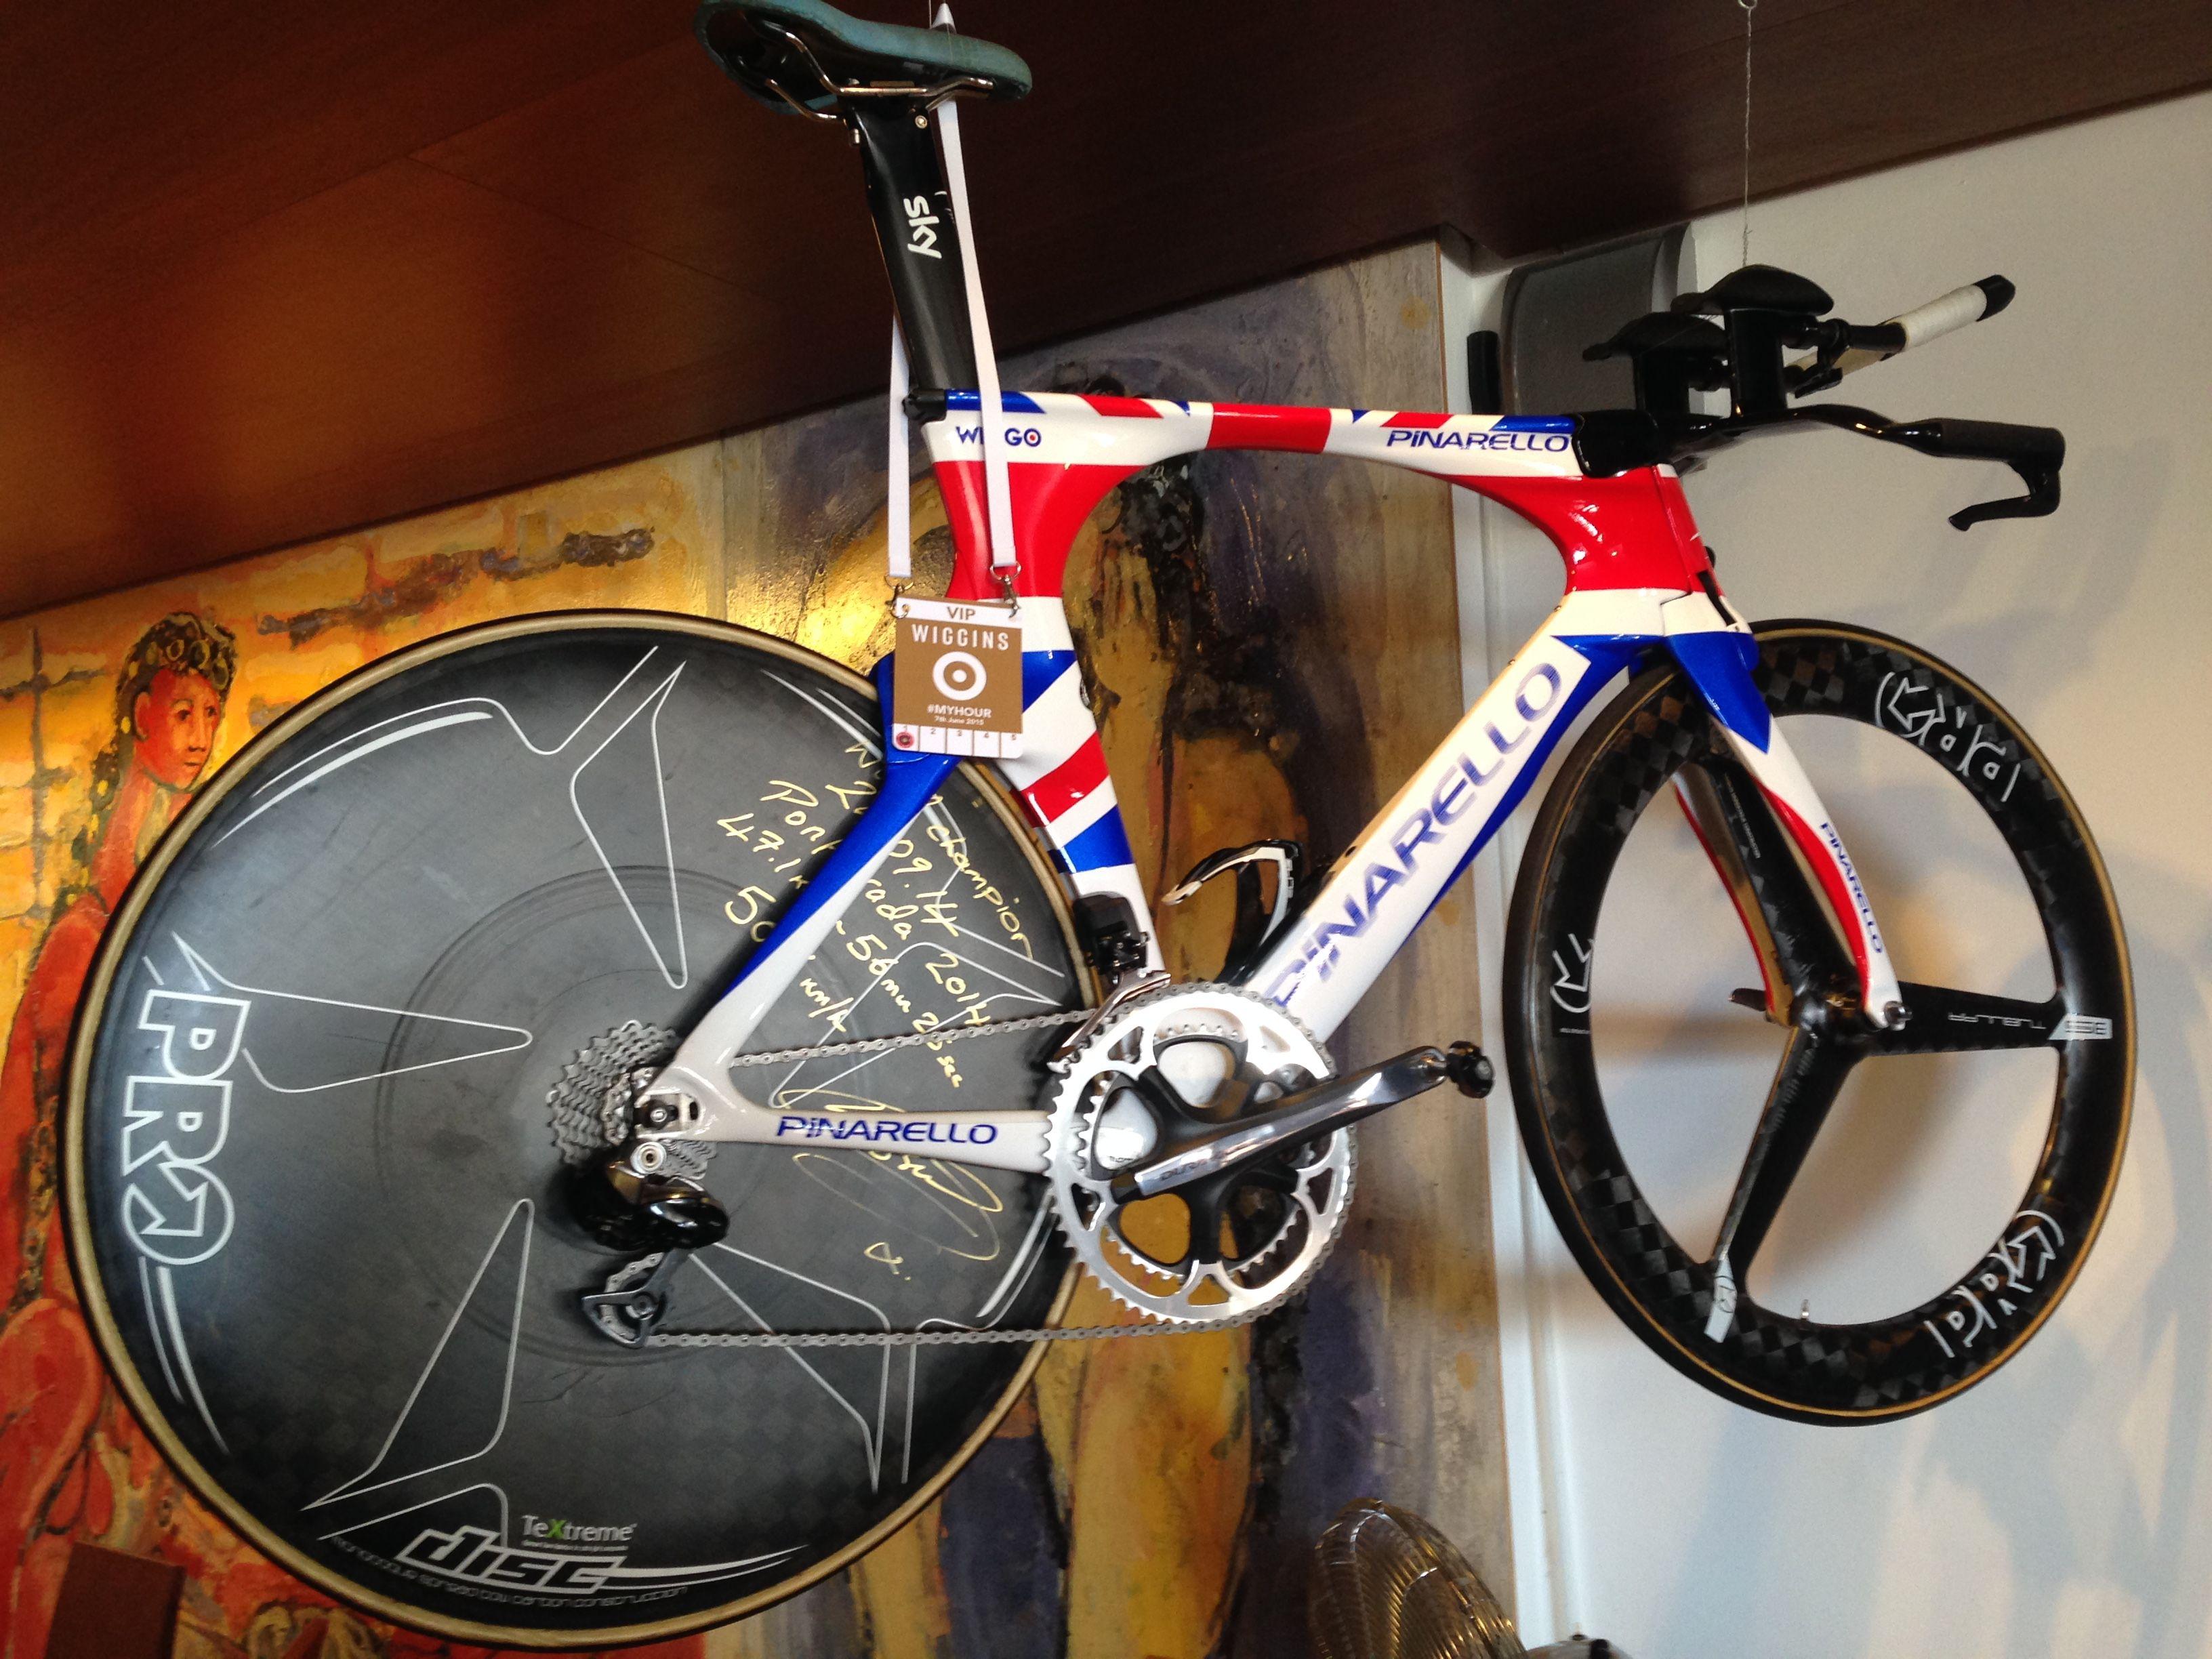 Bradley Wiggins Pinarello time trial bike hanging in Tolos Restaurant in Porto Pollenca